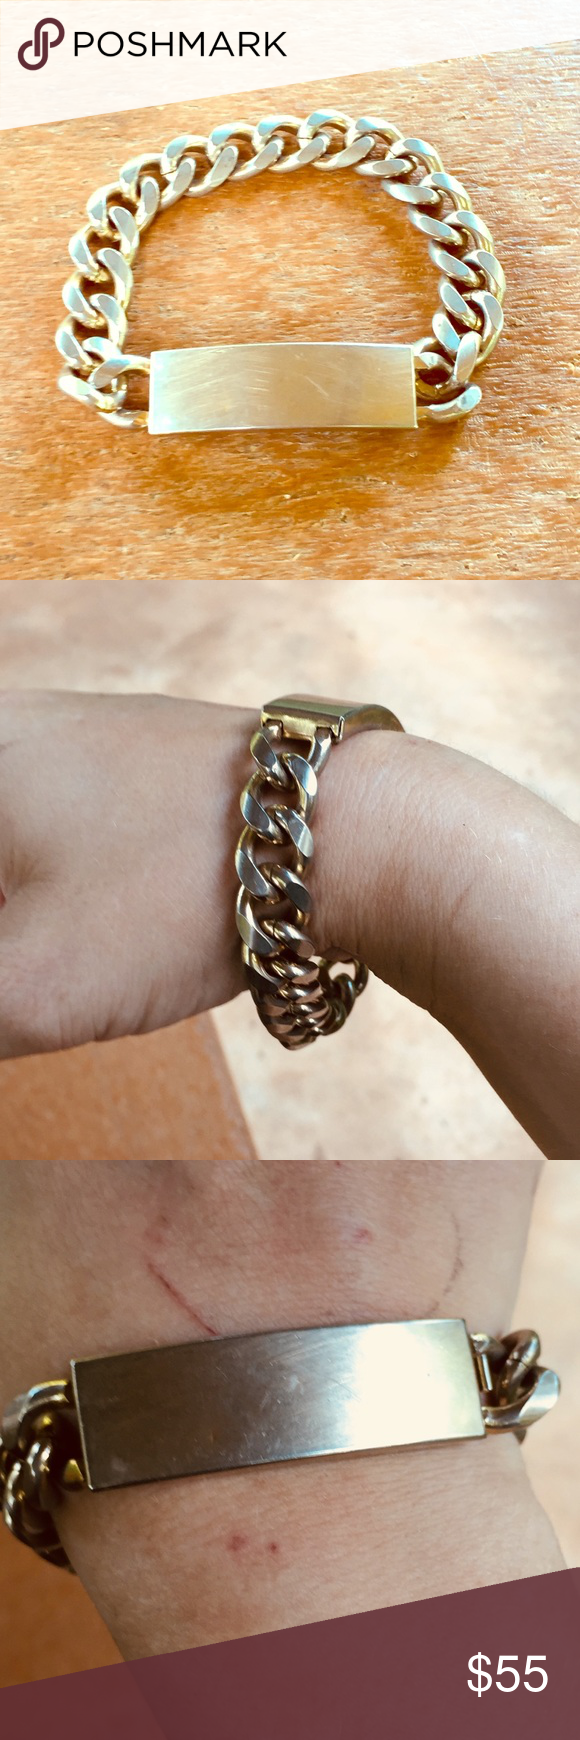 Vintage unisex gold plated chain id bracelet pinterest metal